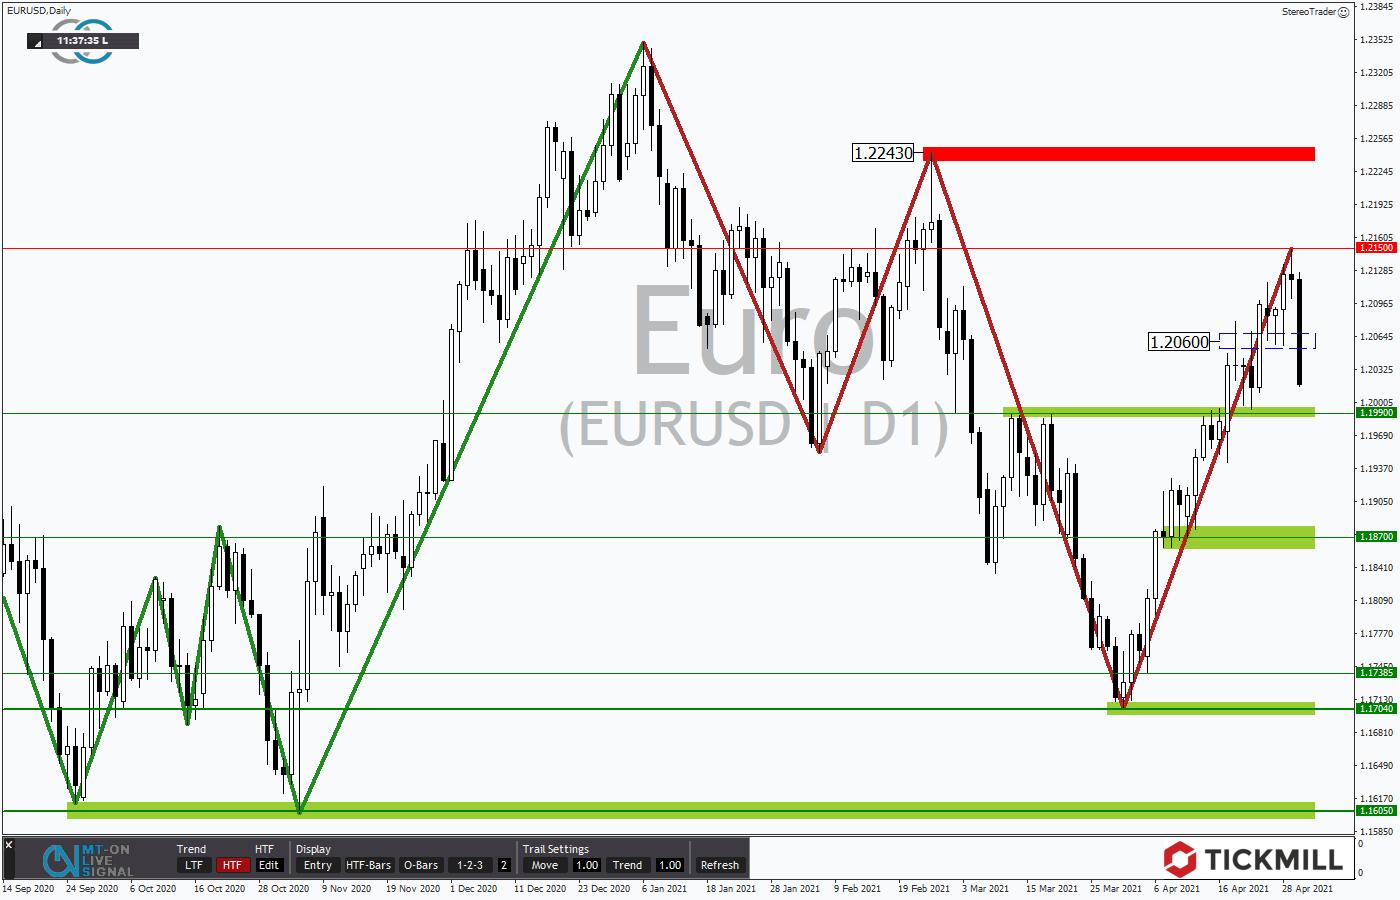 Tickmill-Analyse: EURUSD im Tageschart